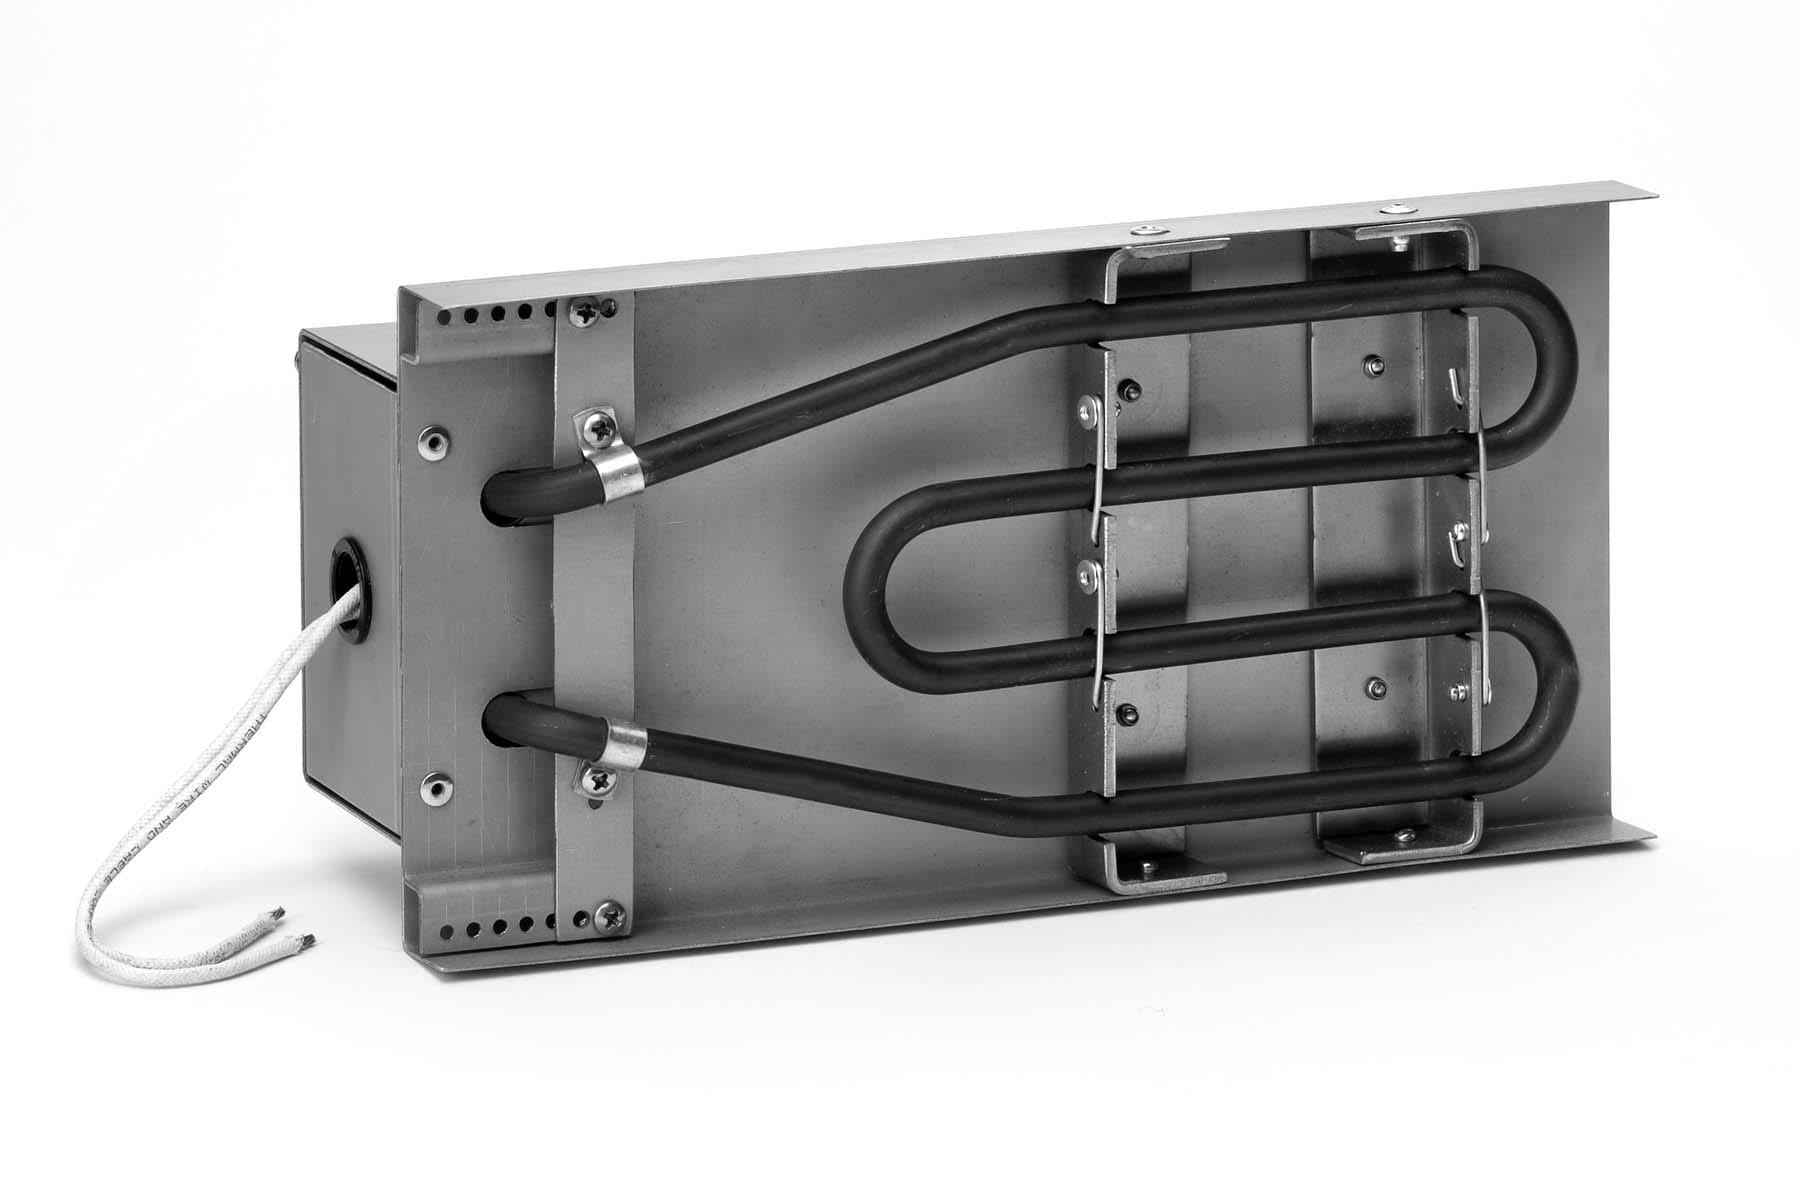 Chromalox FSRM high temperature modular hopper heater